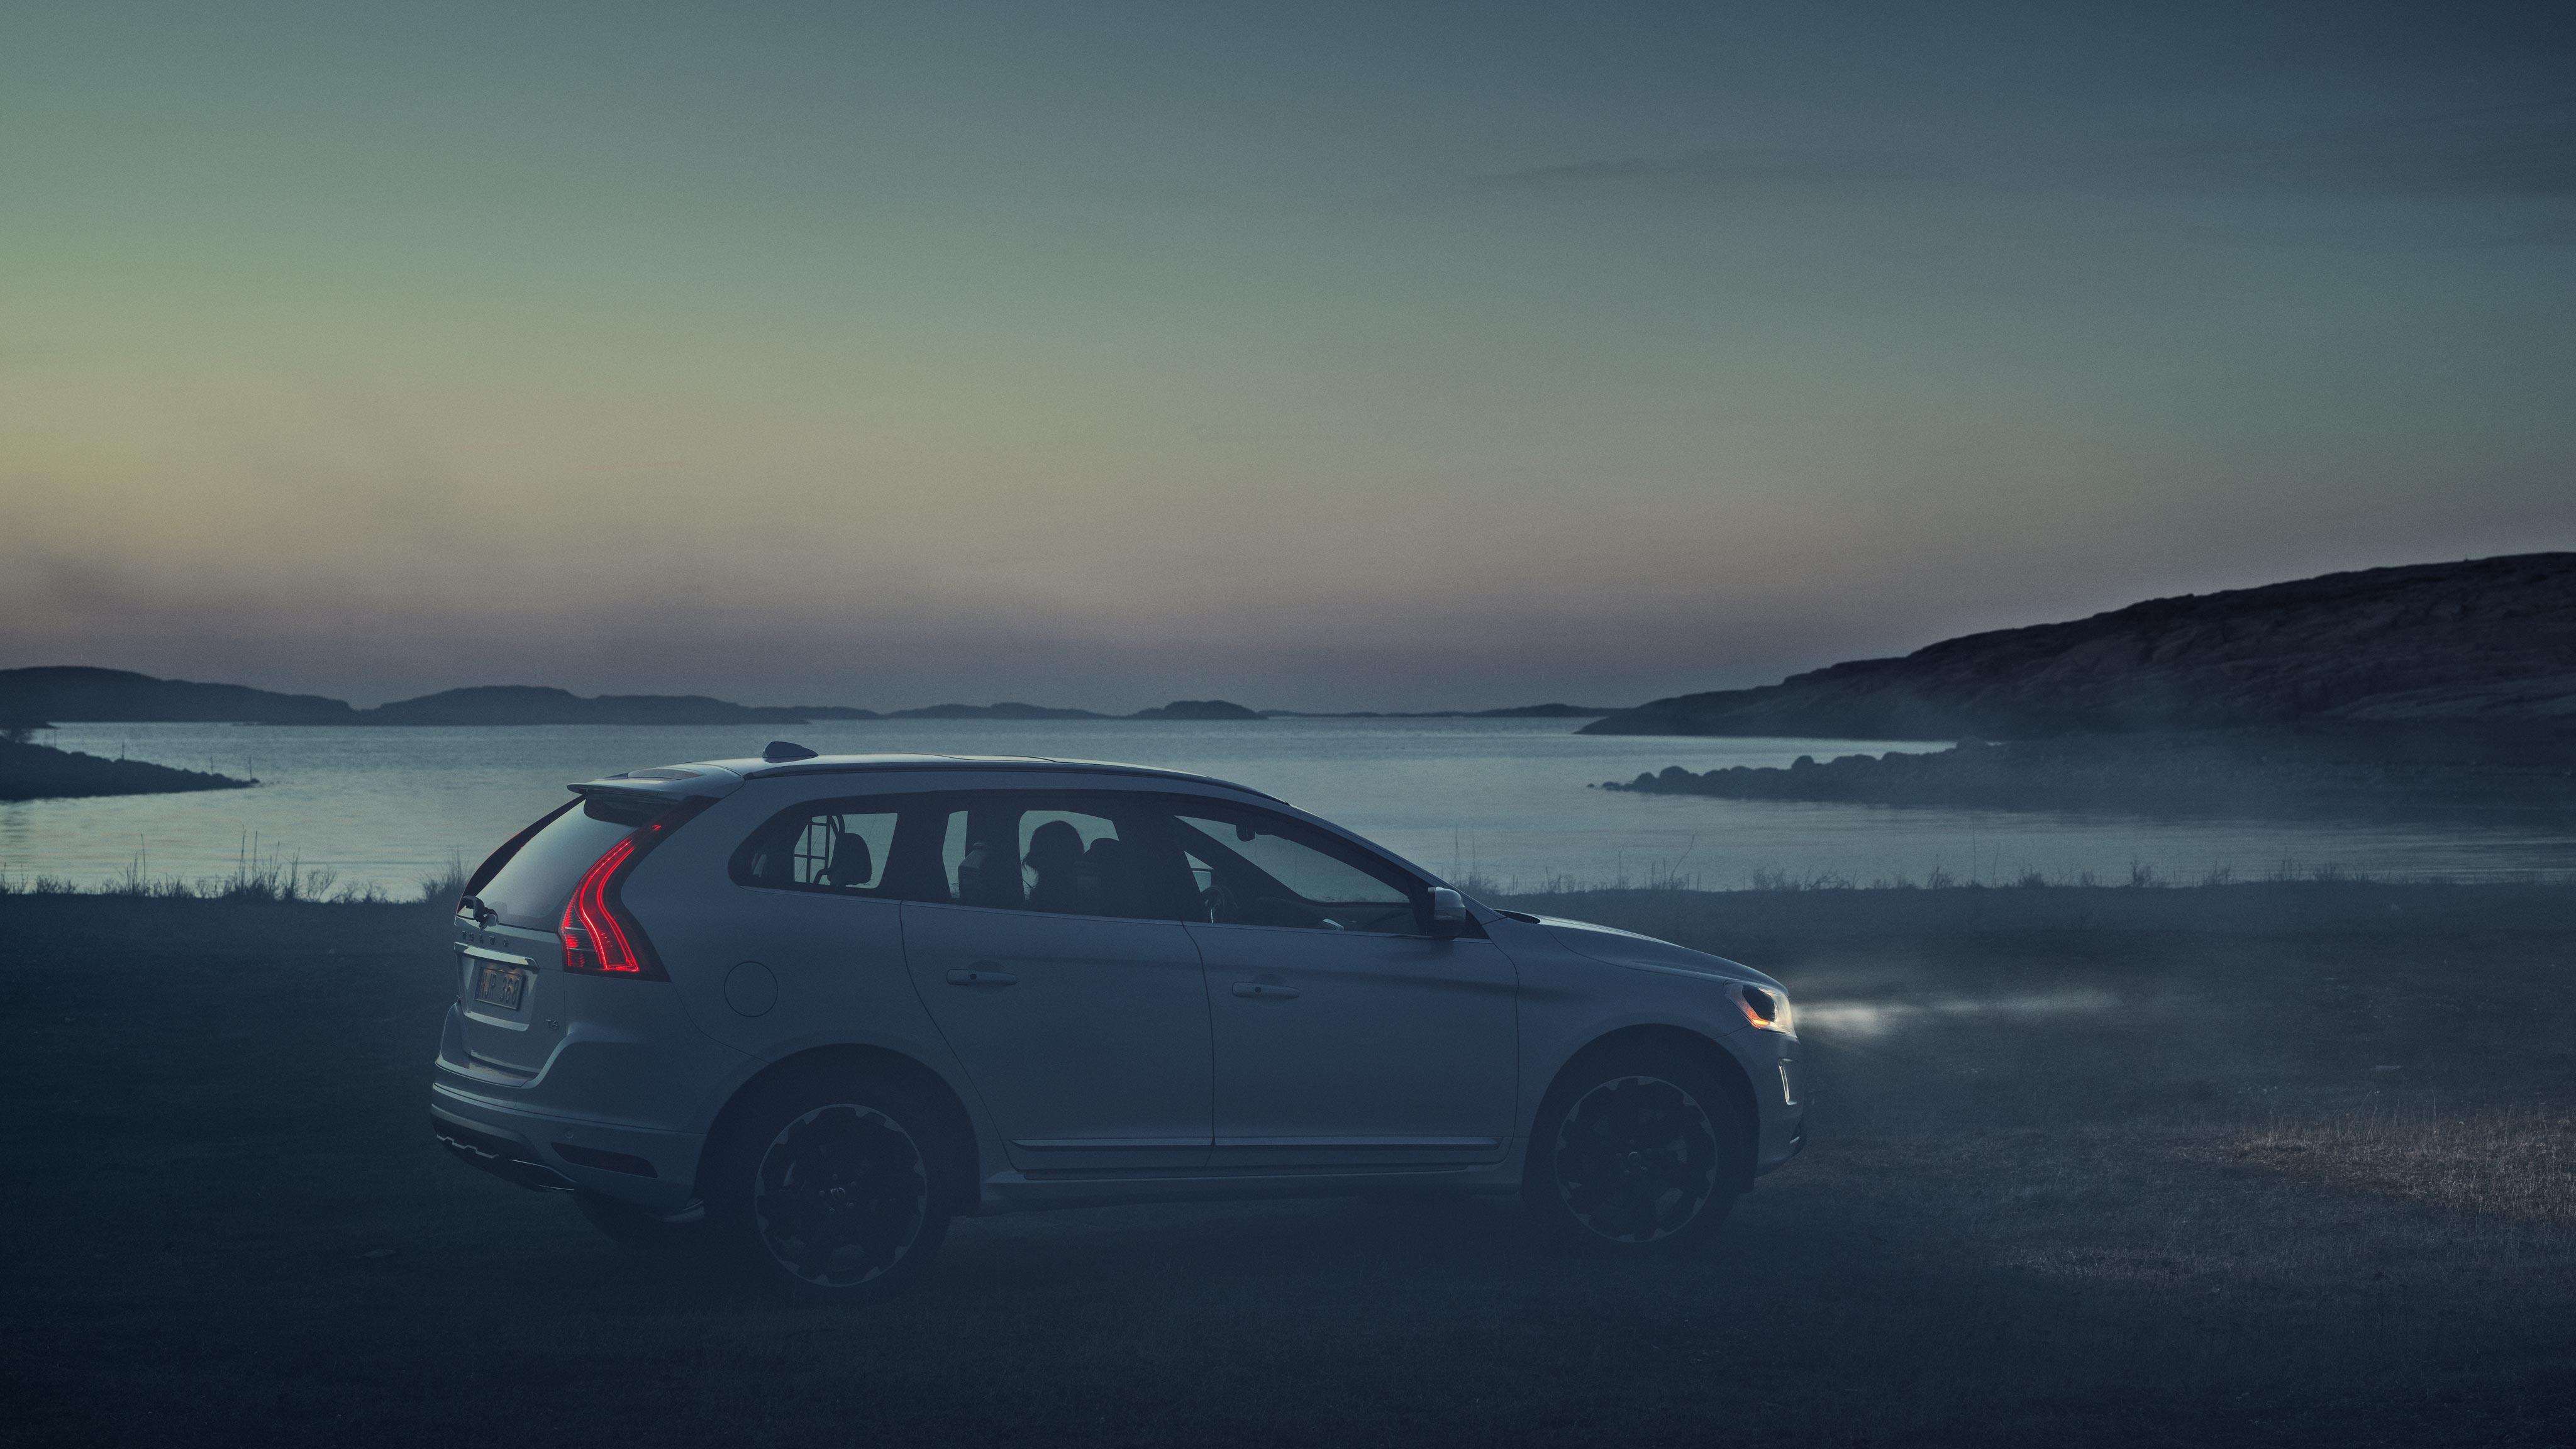 Military And Diplomatic Volvo Cars Uk